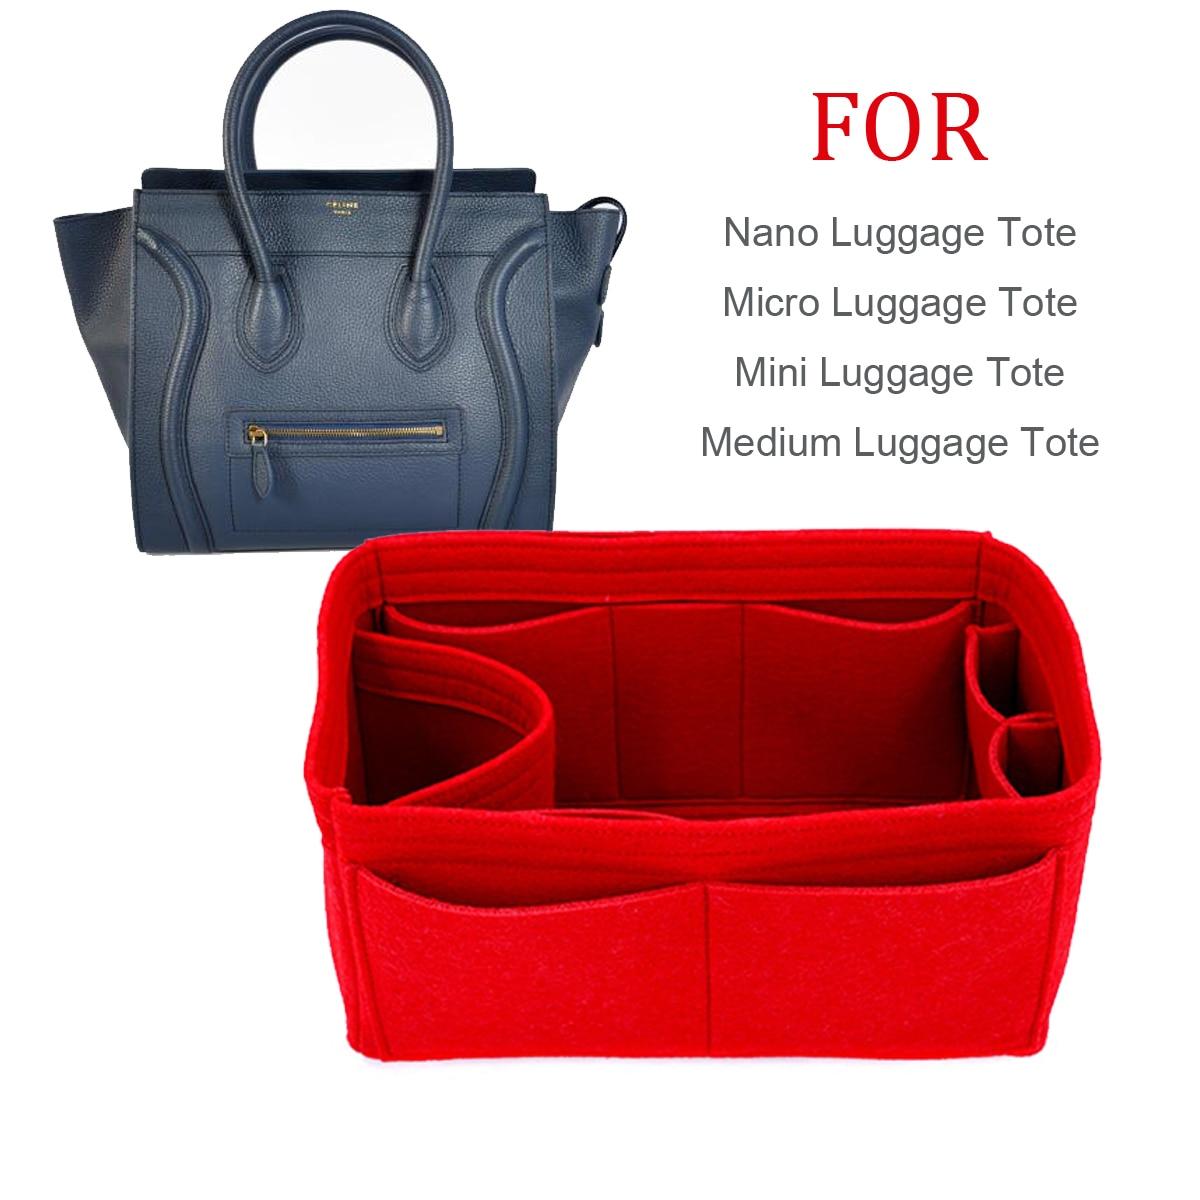 For Luggage Micro Mini Nano Medium Luggage Bag Shaper Purse Insert Makeup Travel Inner Purse Portable Cosmetic Bag Organizer